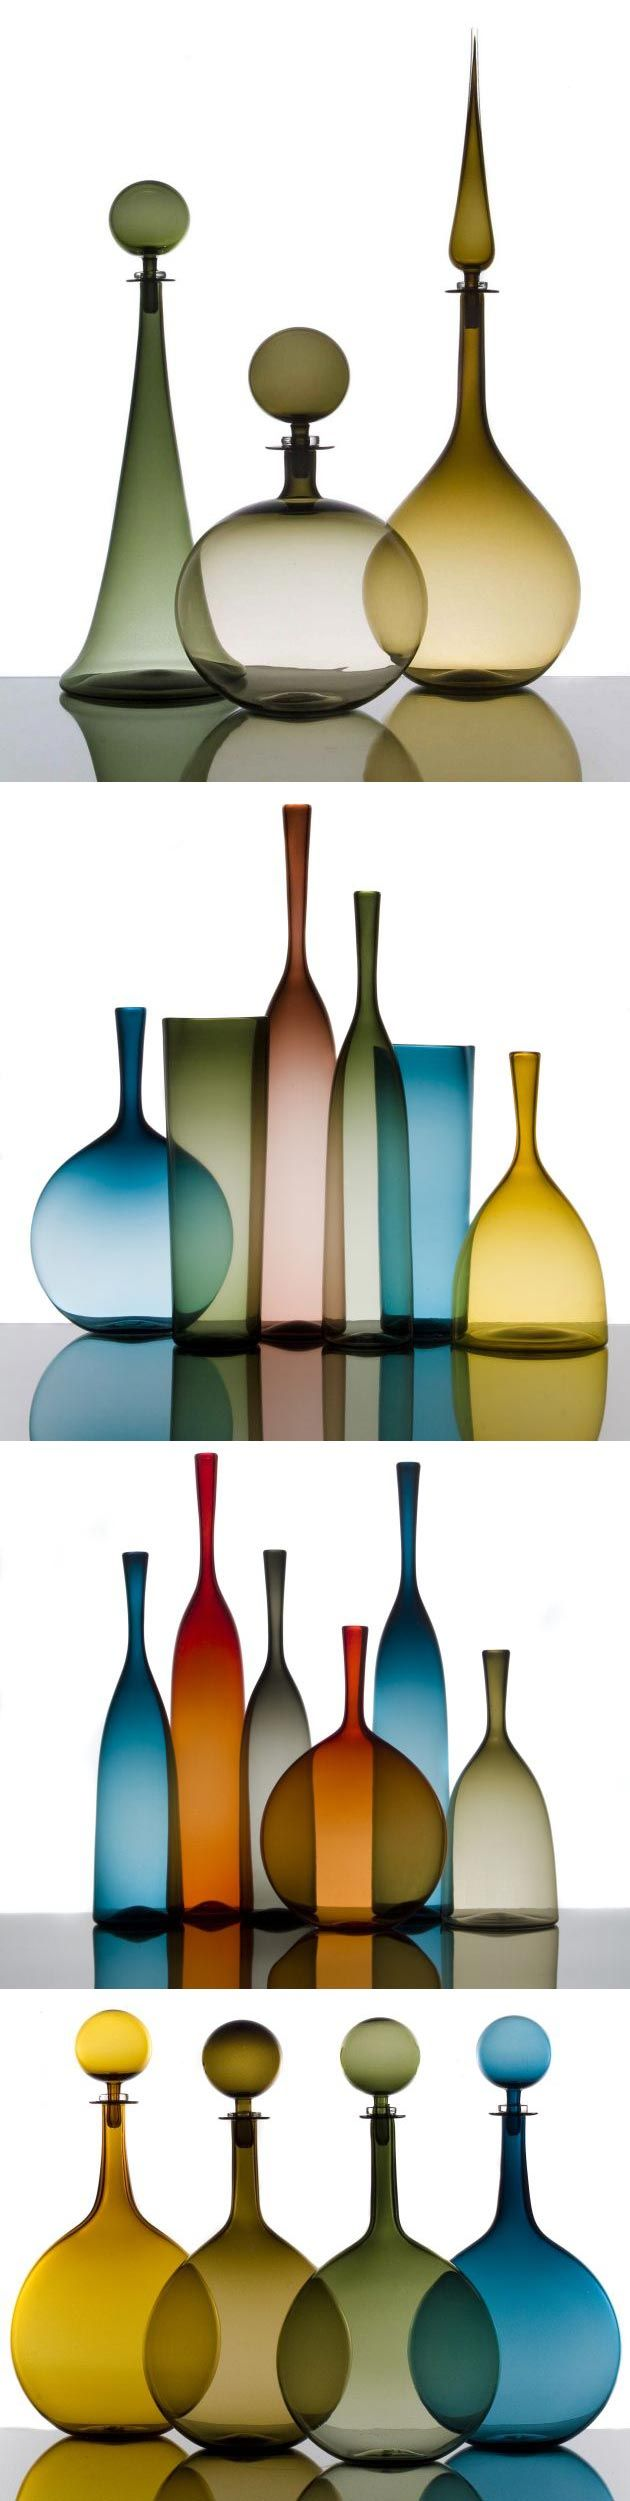 Joe Cariati does beautiful glassware in beautiful colours. via The Contemporist